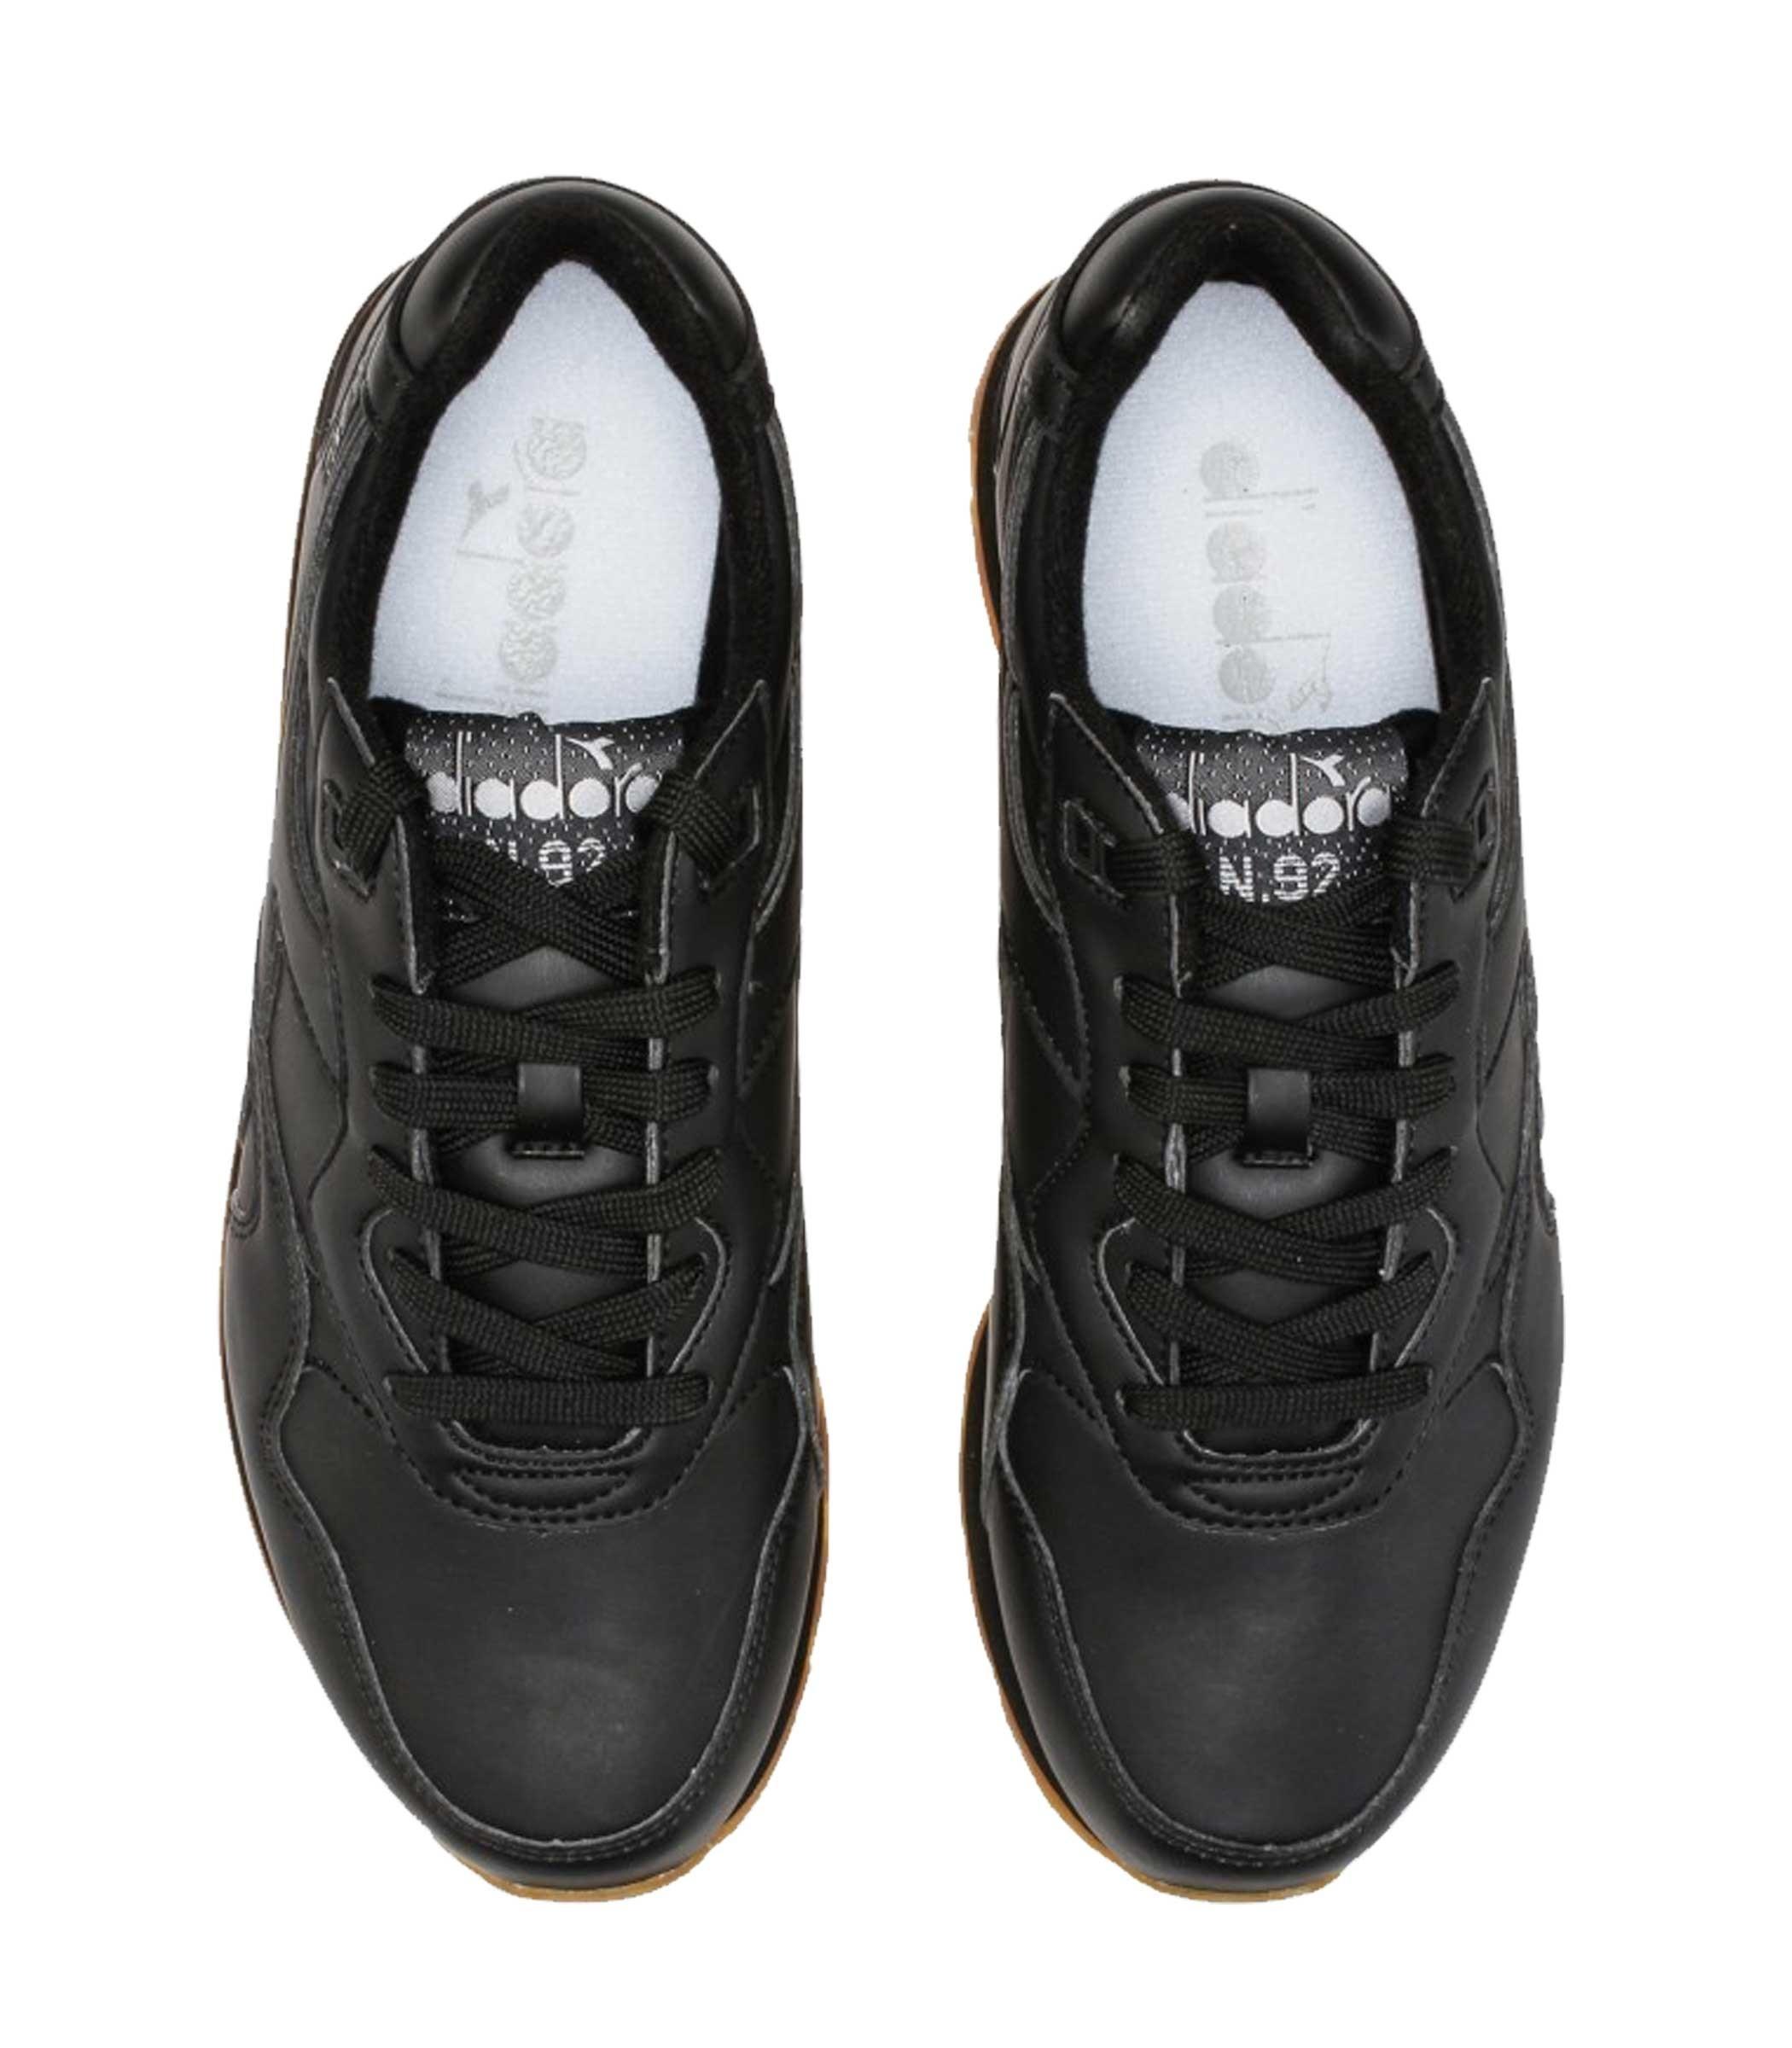 Da Sneakers Uomo L Rif 92 101 173744 Diadora Scarpe N XqwBAA 9e32ba739a5